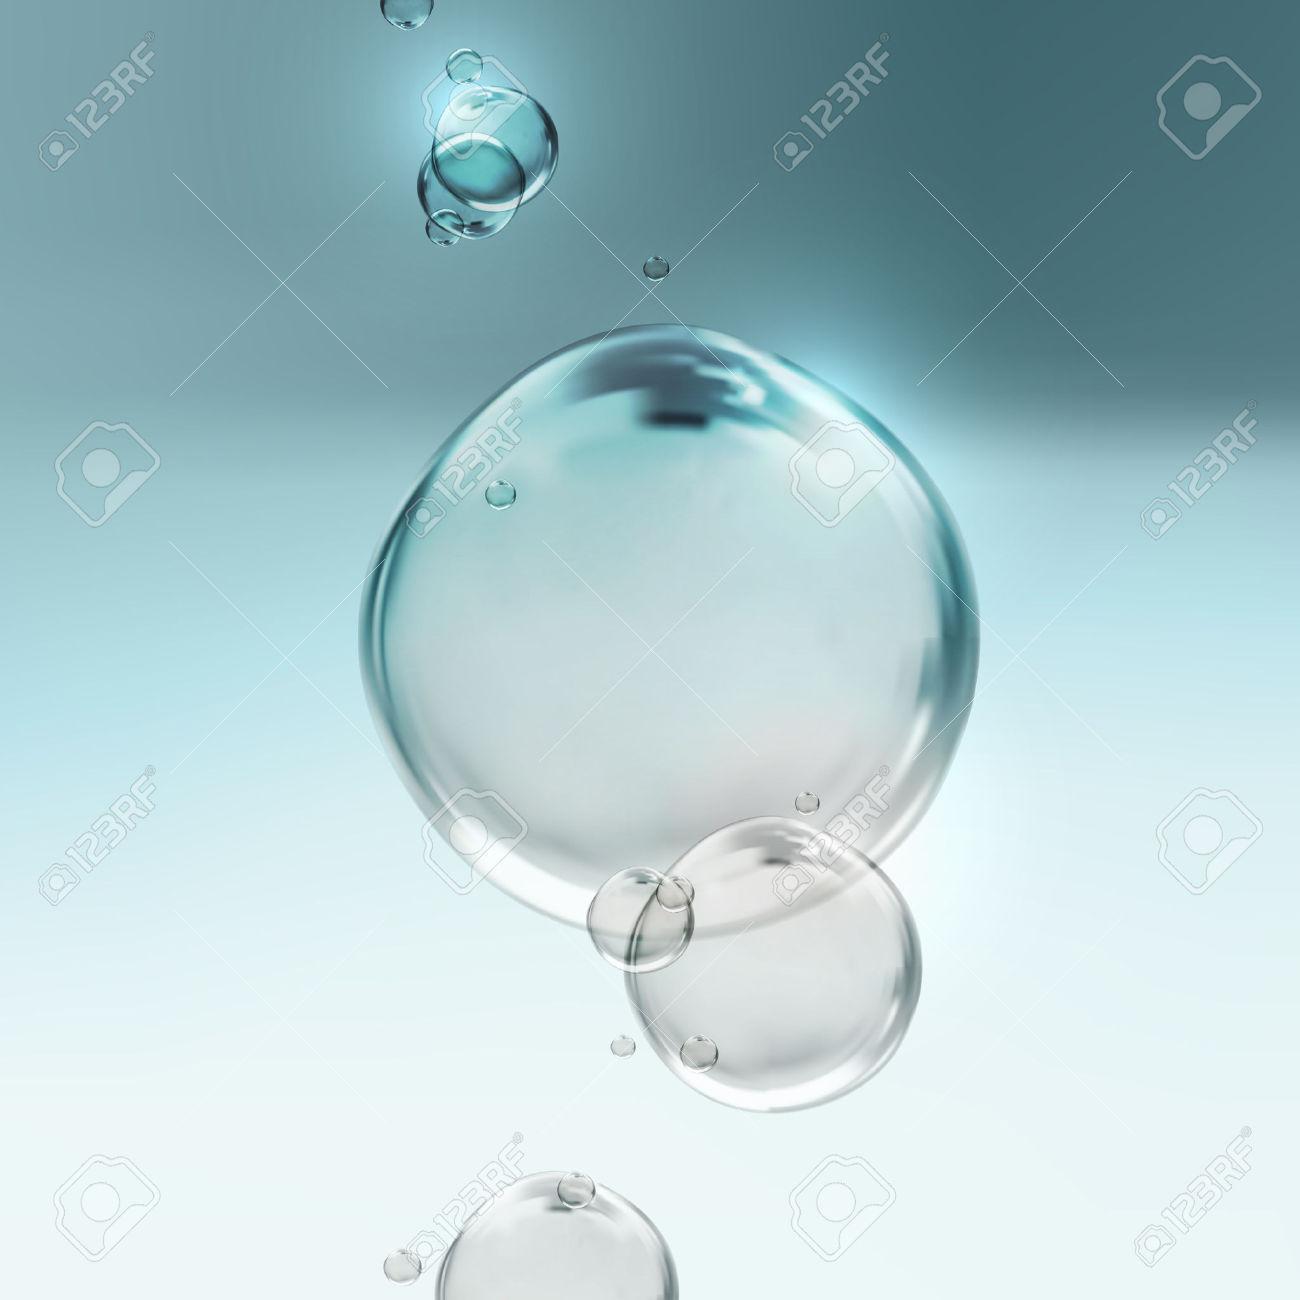 Water bubbles shiny clipart.